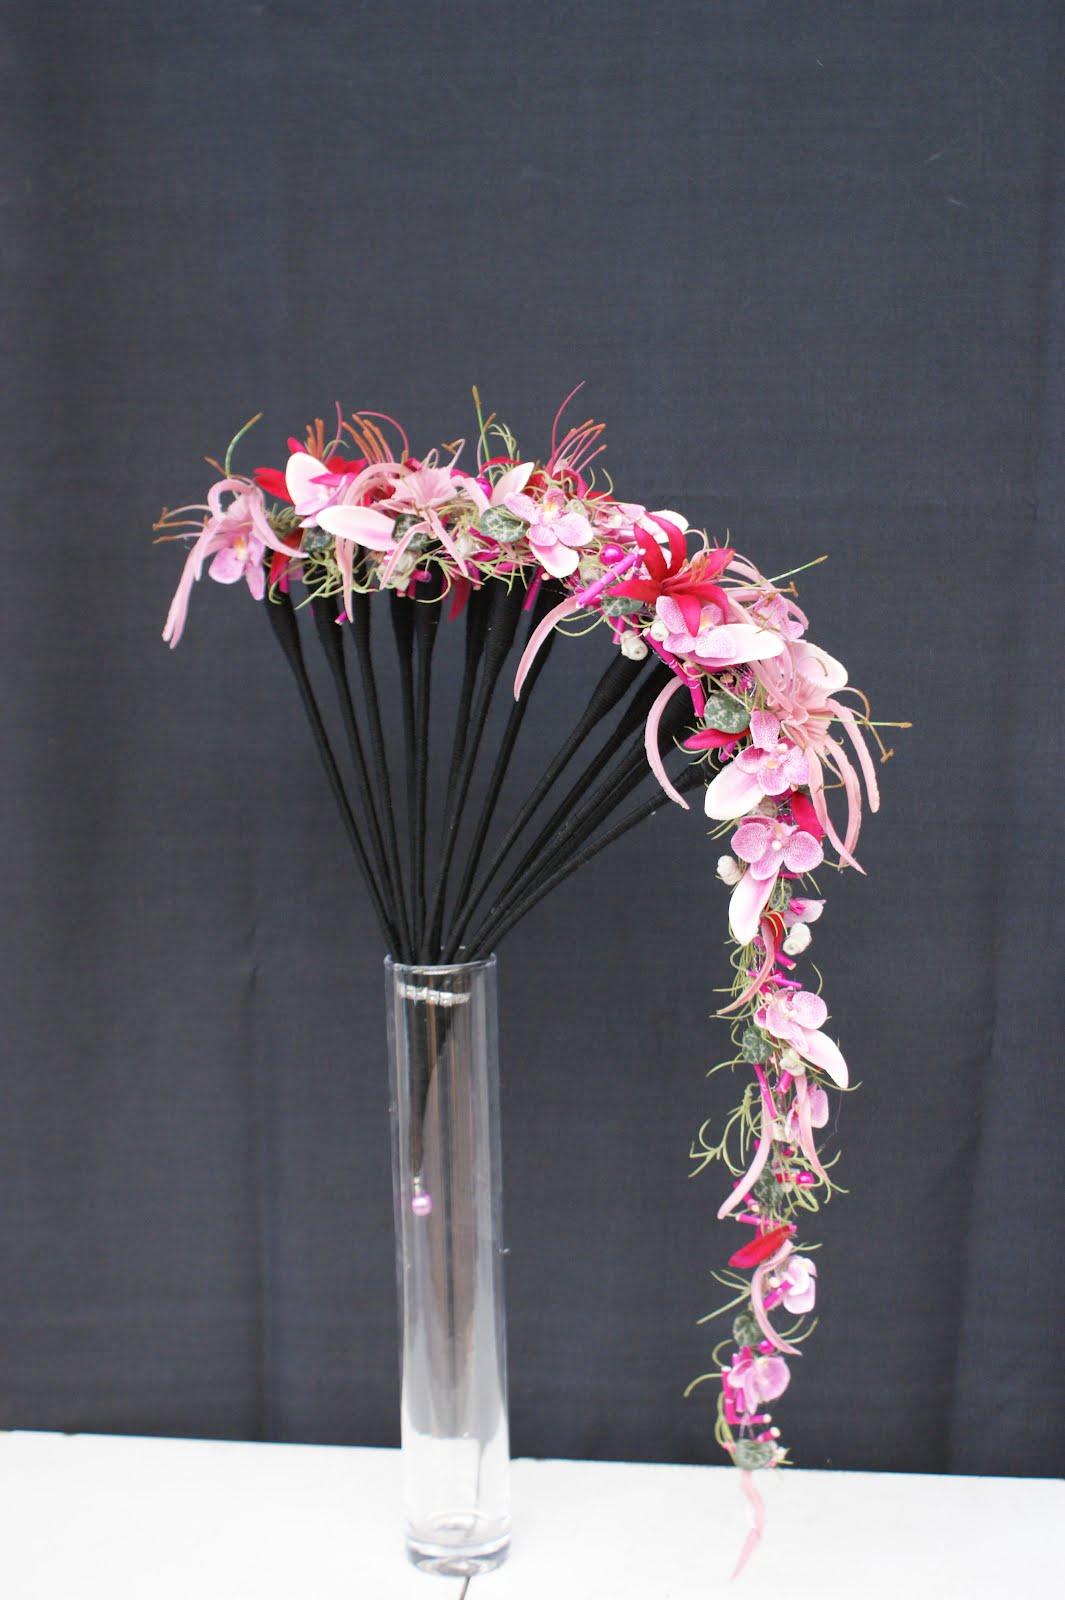 Nicolas rivoallan fleuriste for Bouquet fleuriste